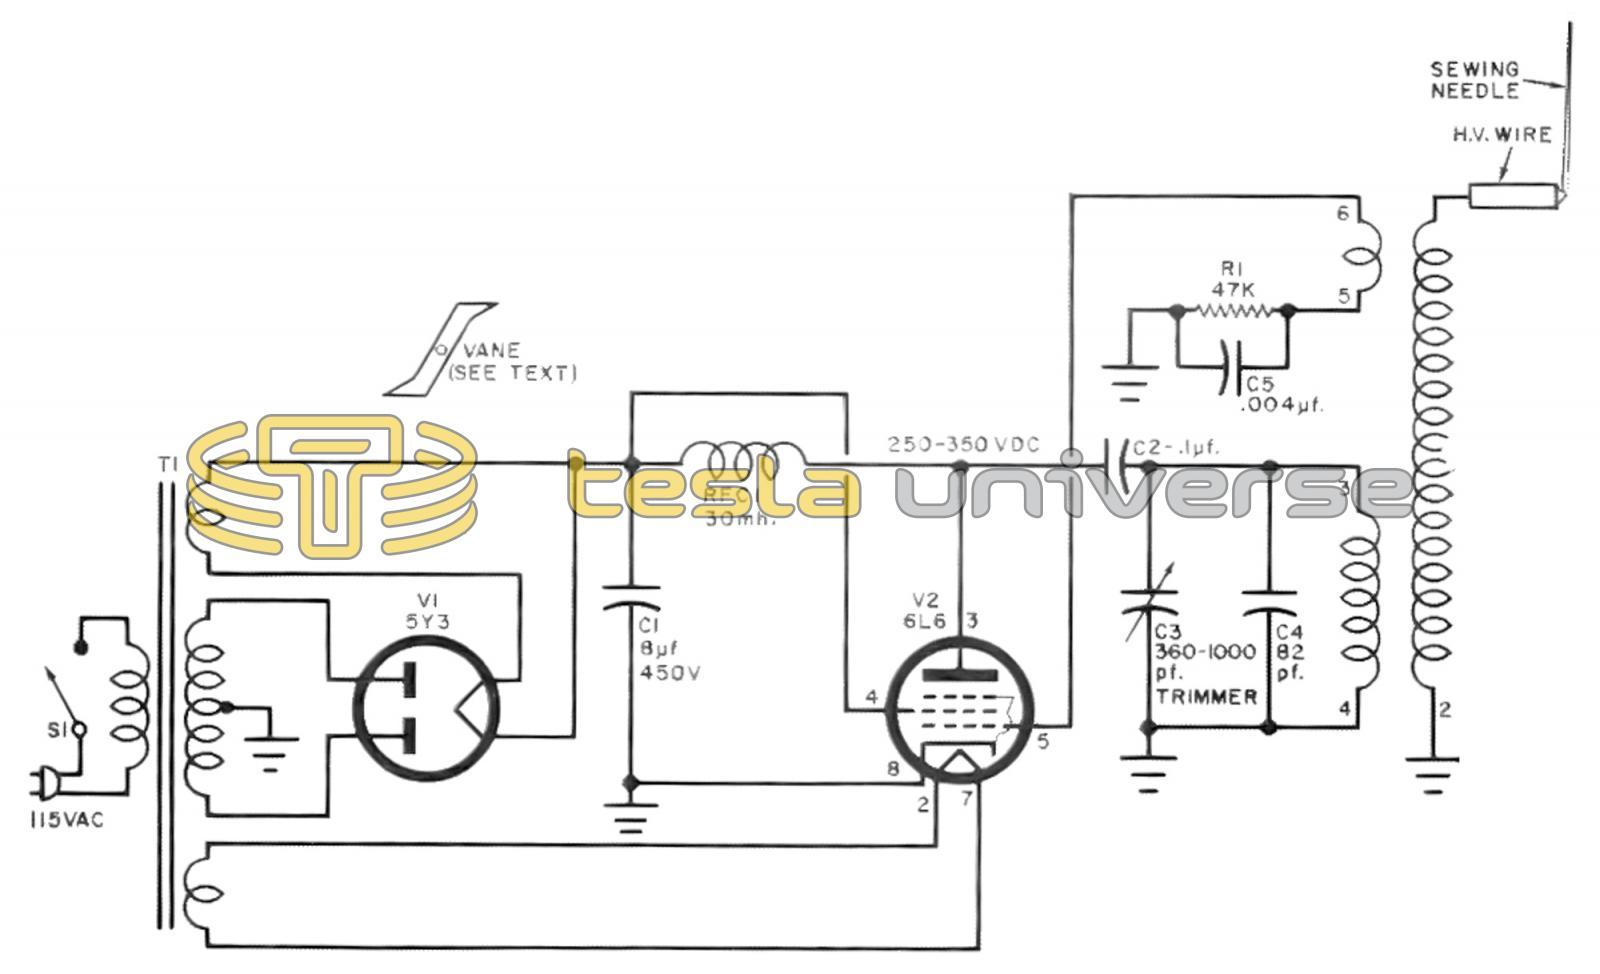 Trimmer Wiring Diagram | Wiring Liry on